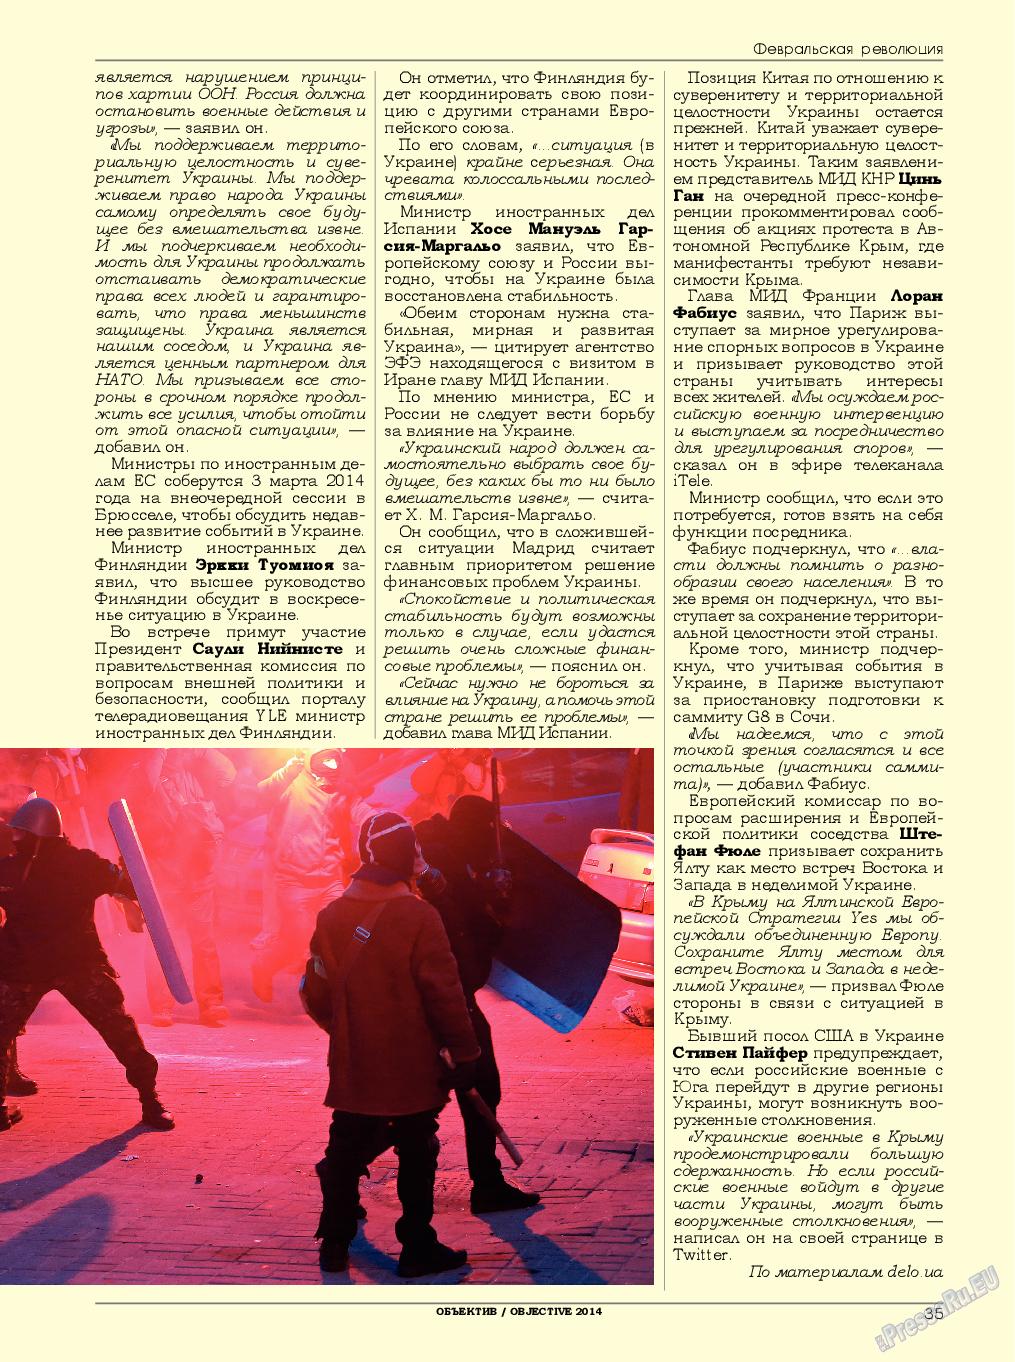 Объектив EU (журнал). 2014 год, номер 2, стр. 35